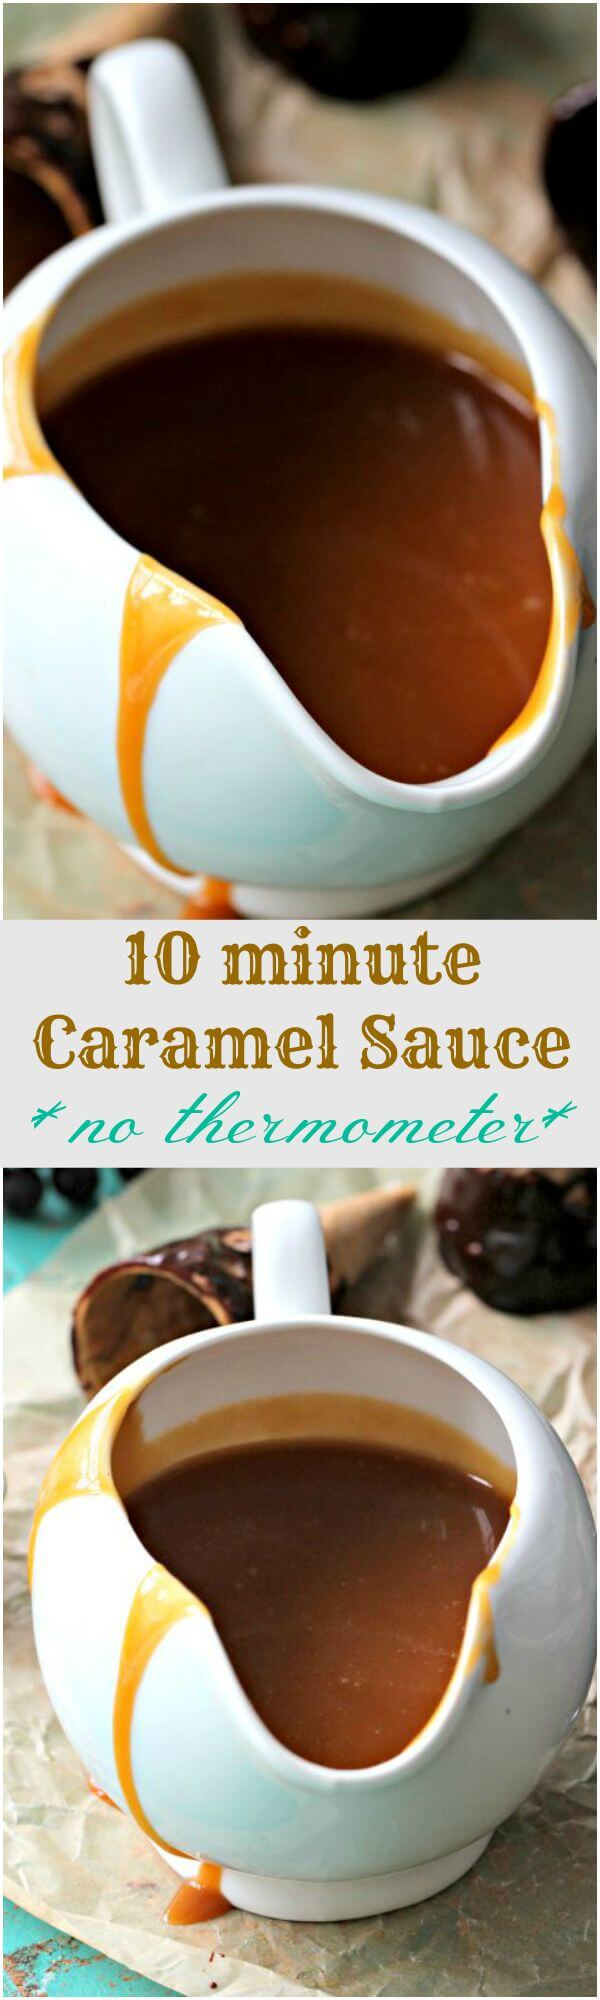 caramel sauce no thermometer